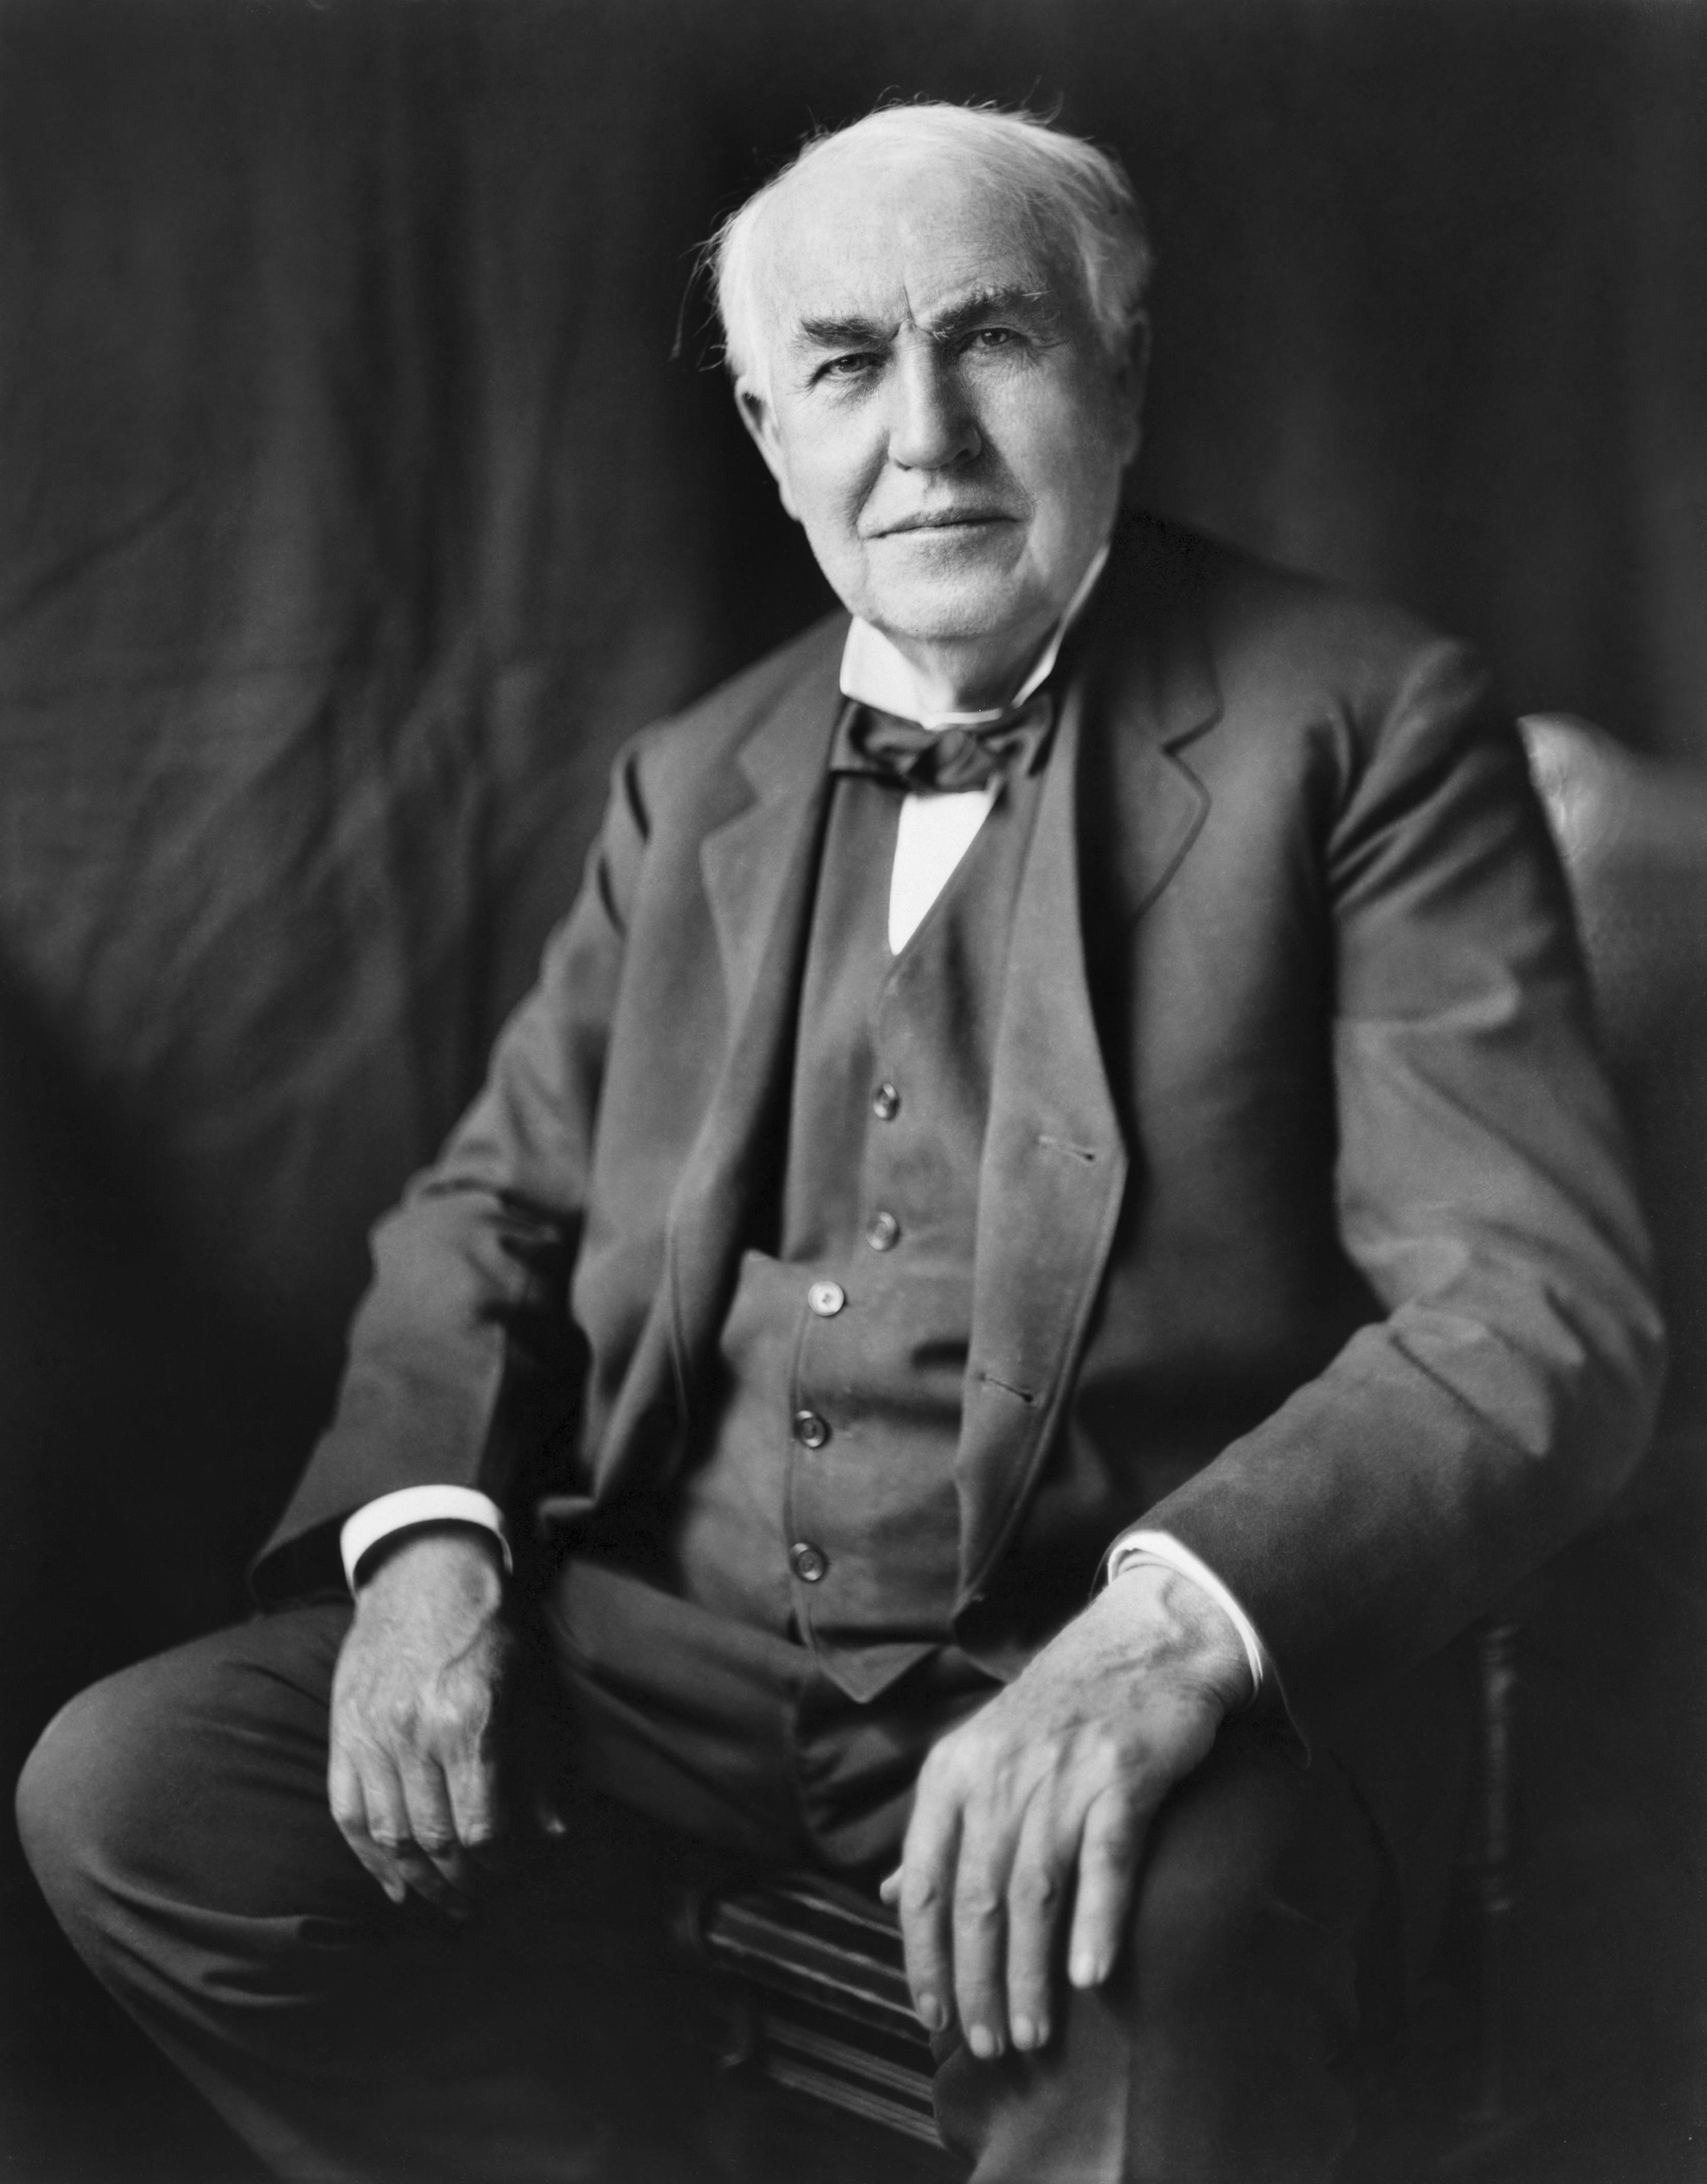 Depiction of Thomas Alva Edison